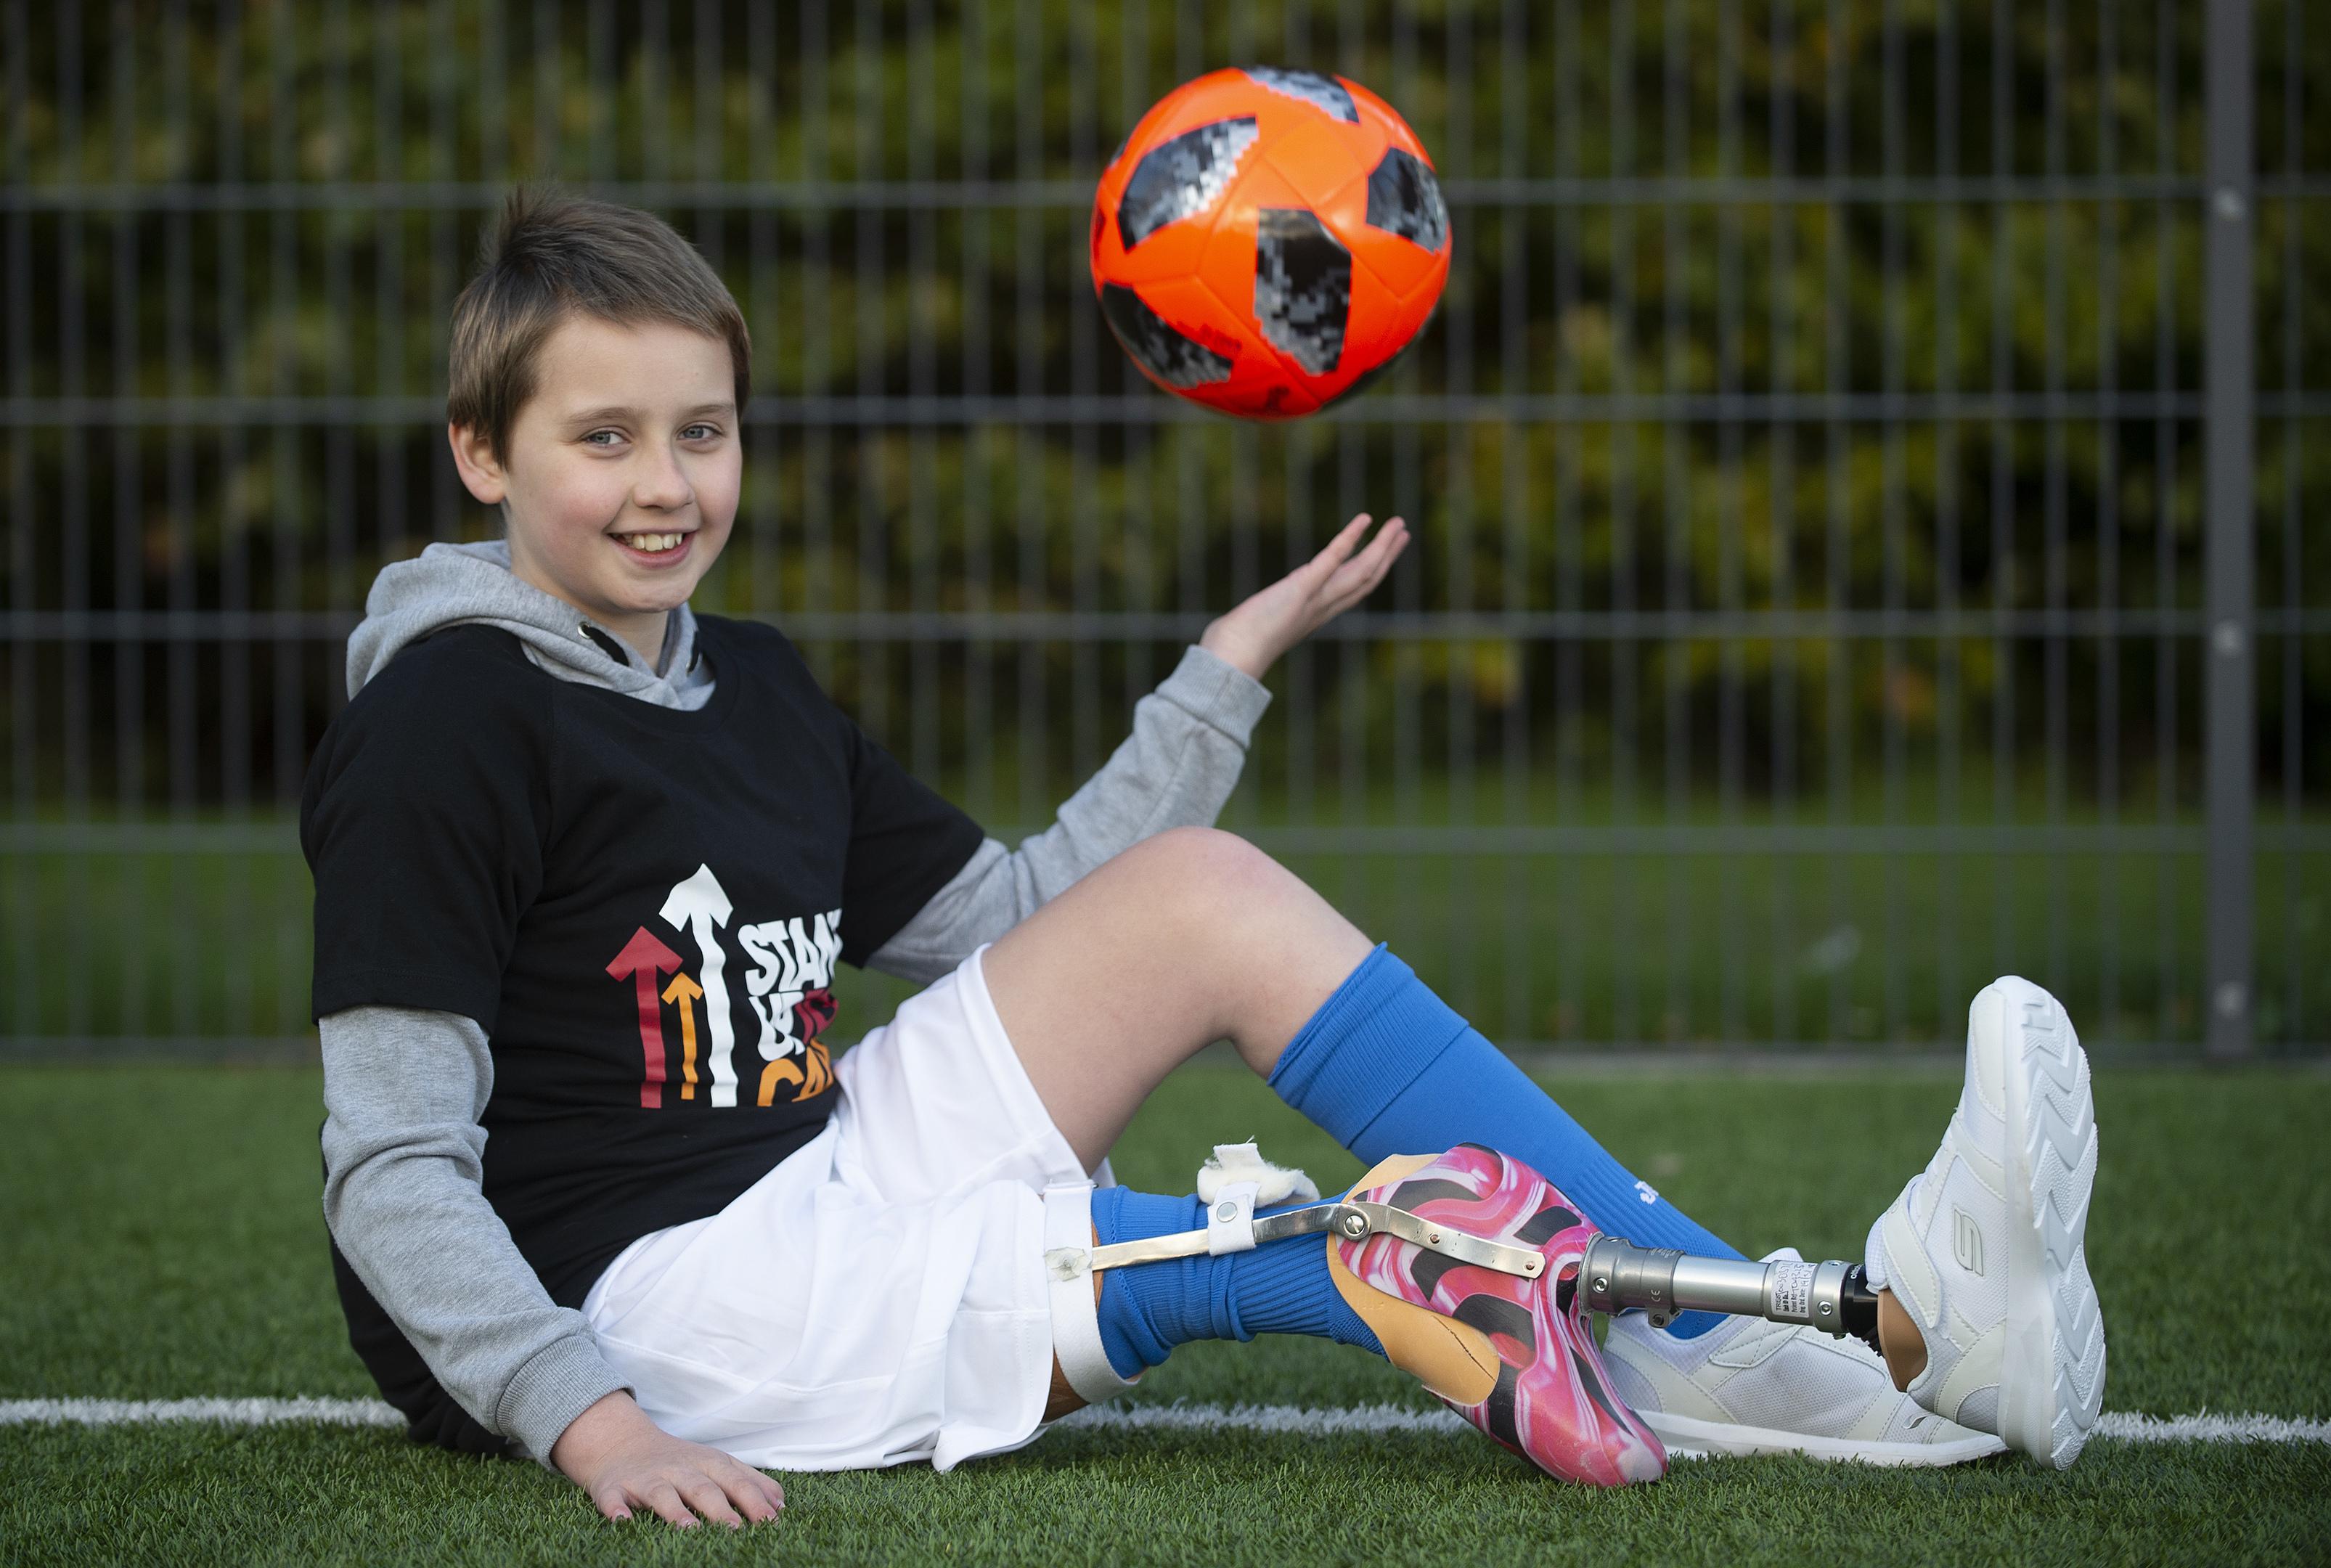 Katies world soccer